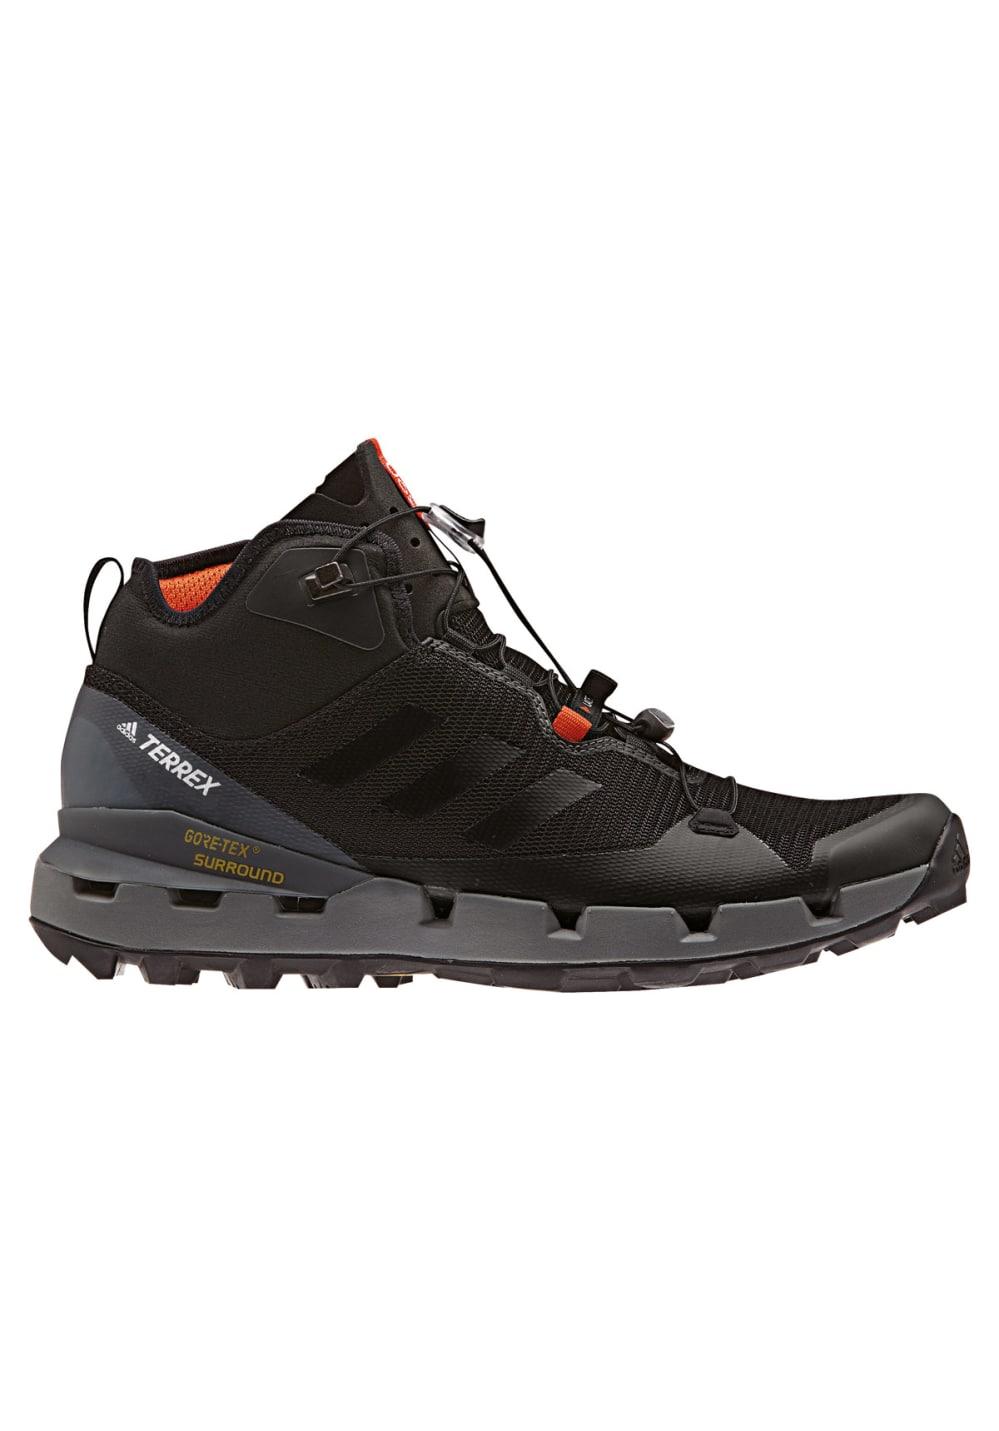 dff45ffb13e adidas TERREX Terrex Fast Mid GTX-Surround - Outdoor shoes for Men - Black